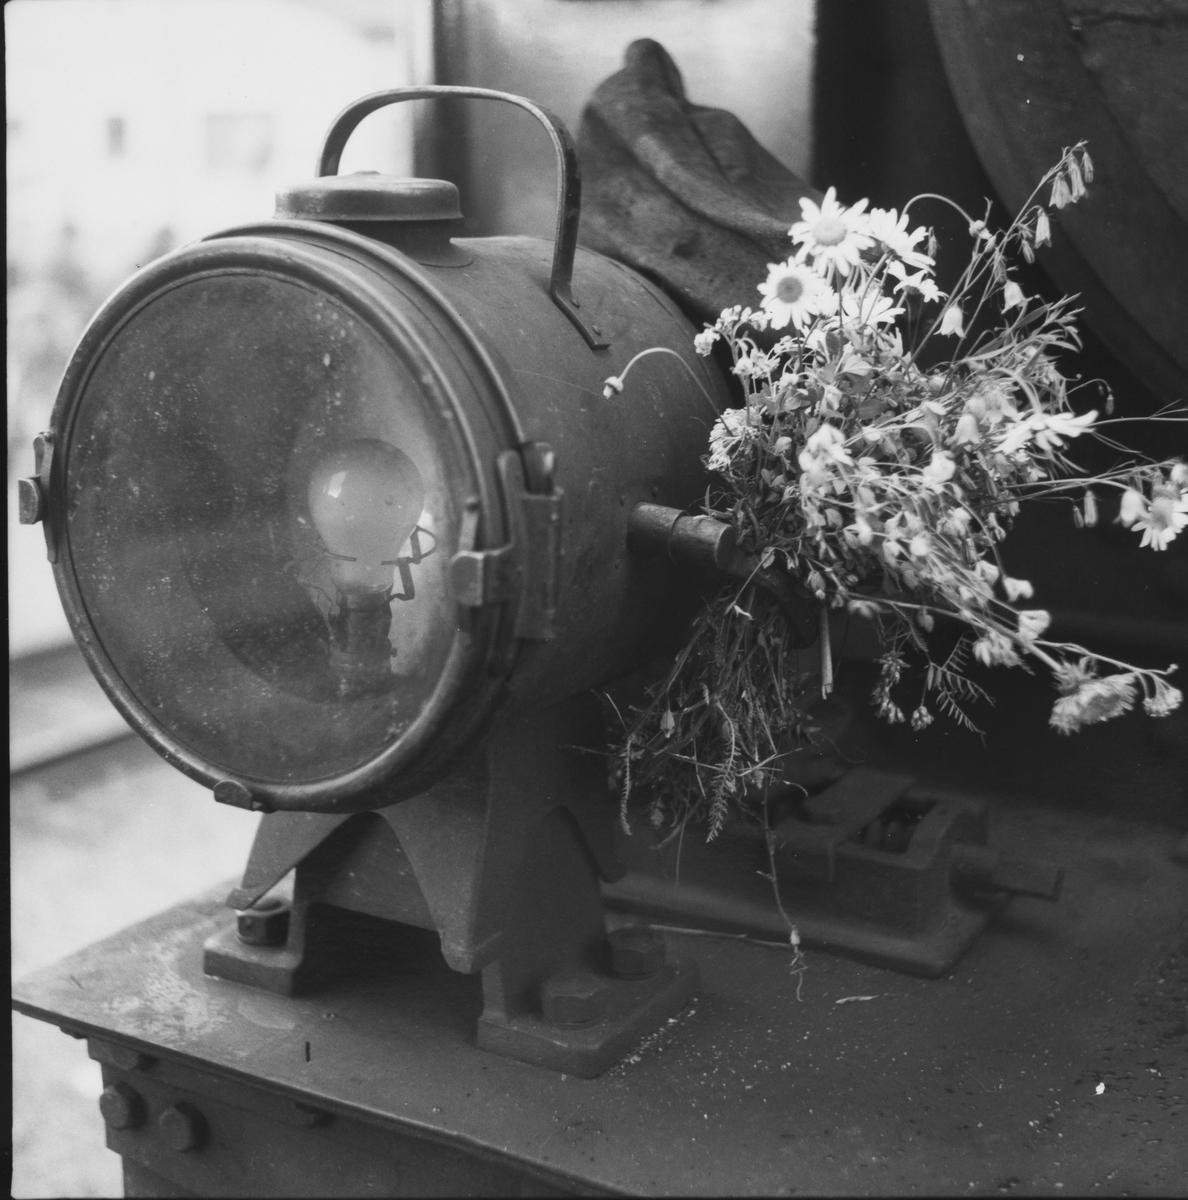 Lok 7 Prydz pyntet med markblomster.